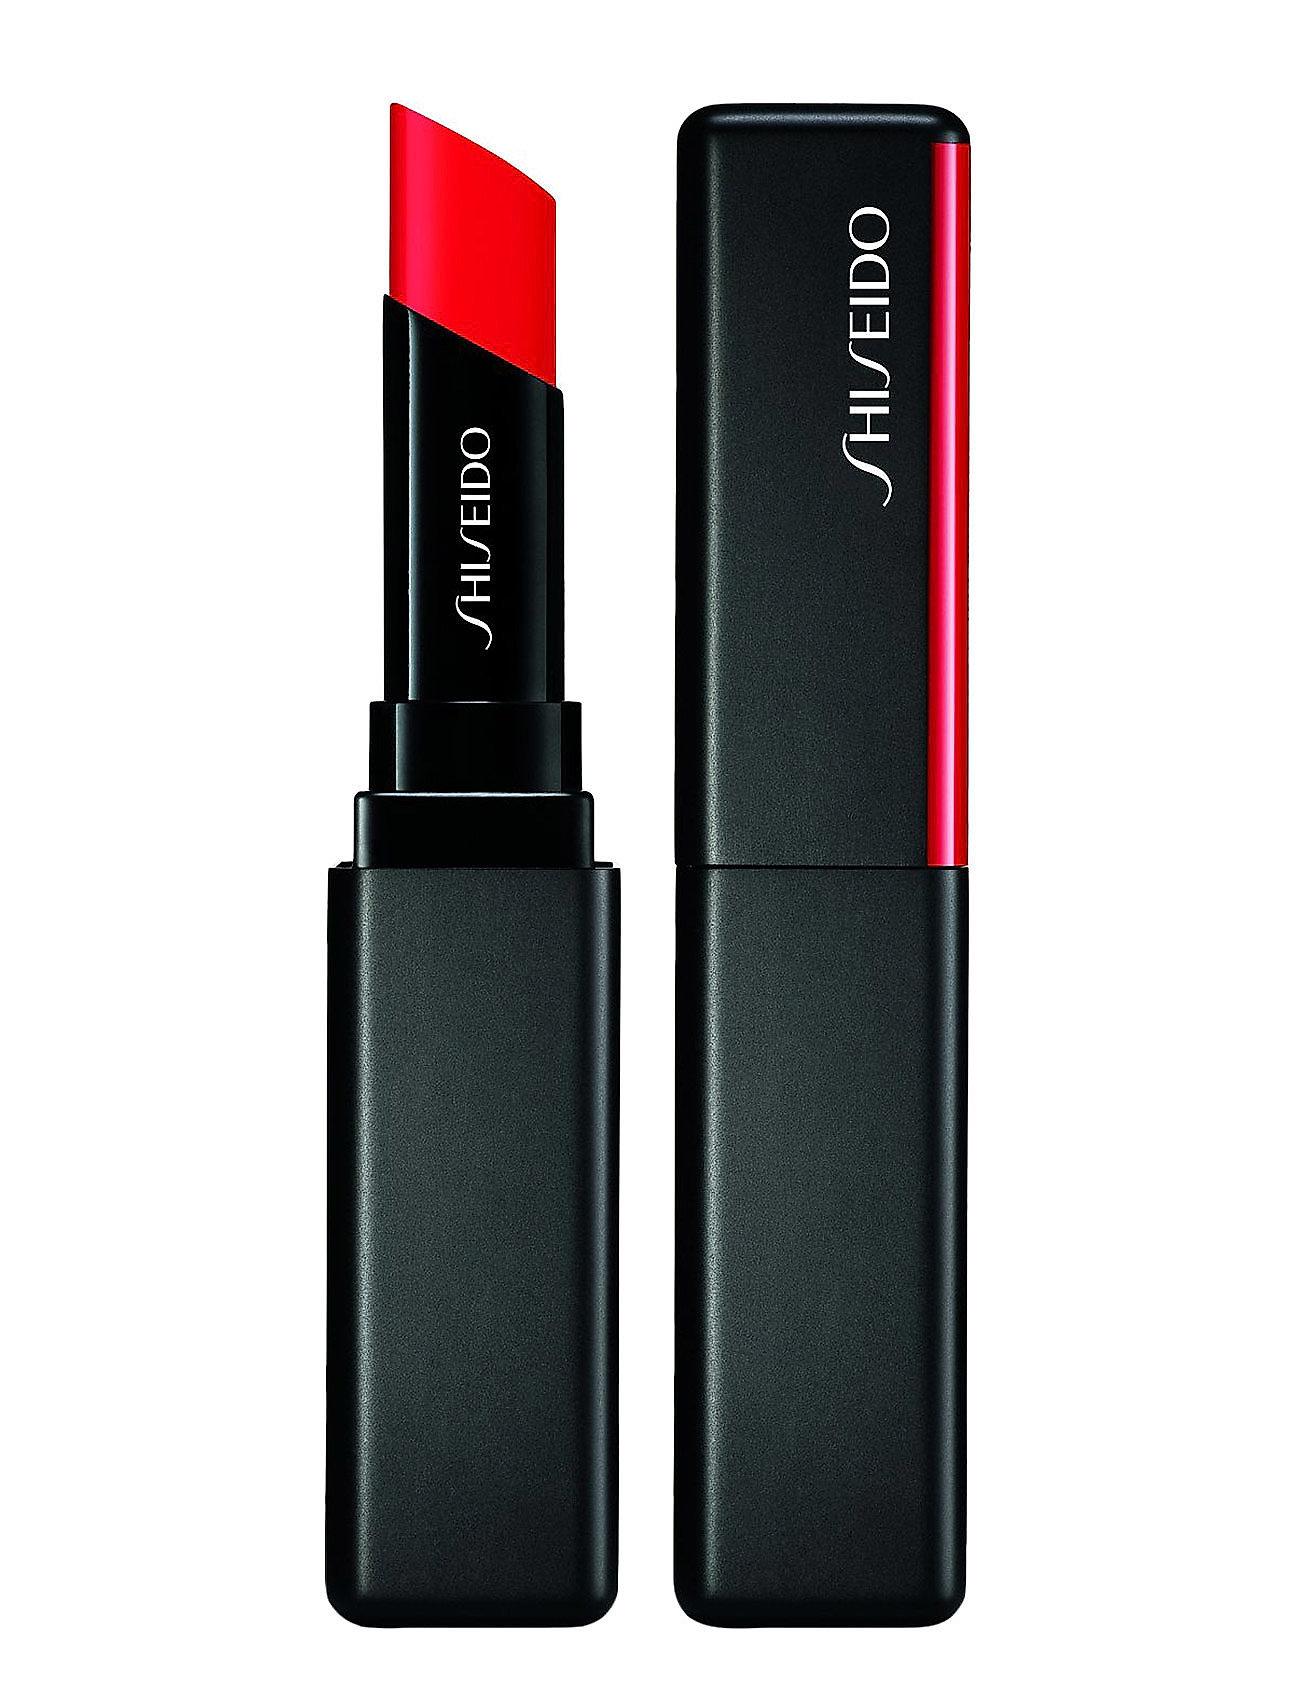 Image of Visionairy Gel Lipstick 218 Volcanic Læbestift Makeup Shiseido (3070276167)